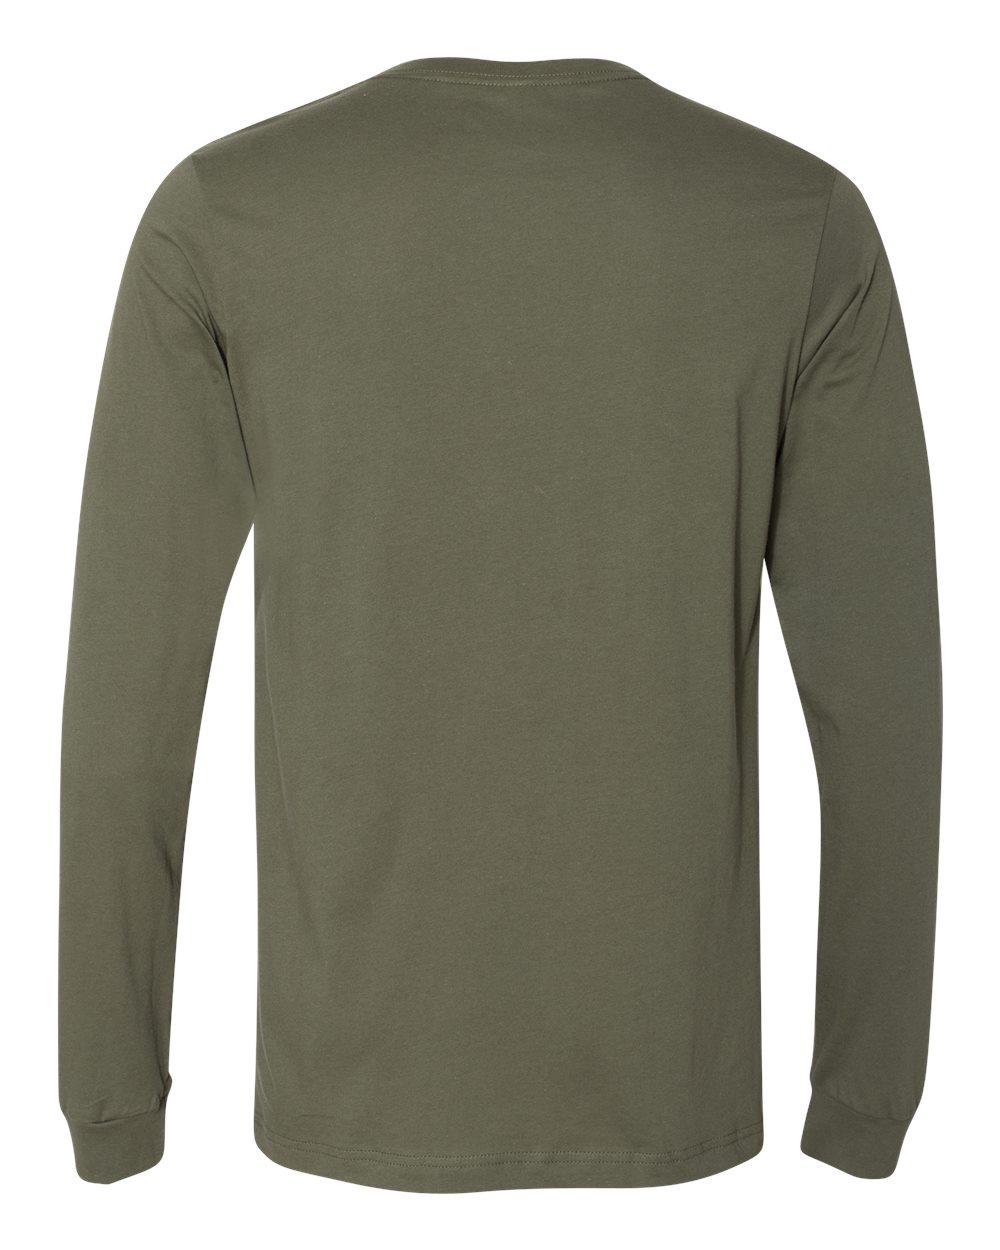 Bella-Canvas-Mens-Blank-Top-Long-Sleeve-Jersey-Tee-T-Shirt-3501-up-to-3XL thumbnail 83